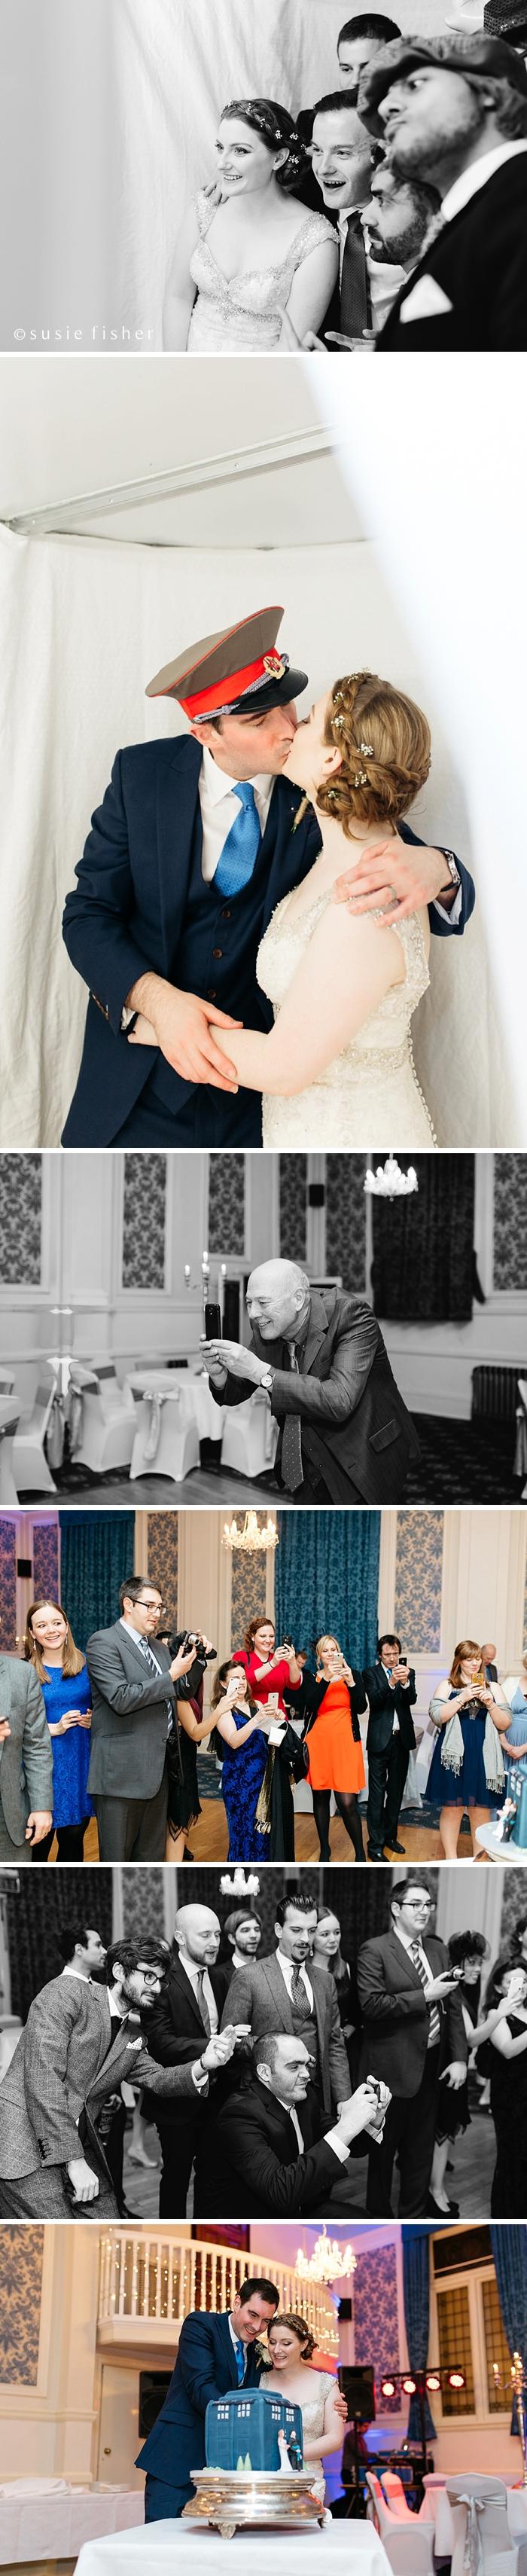 Susie Fisher Photography www.susiefisherphotography.com